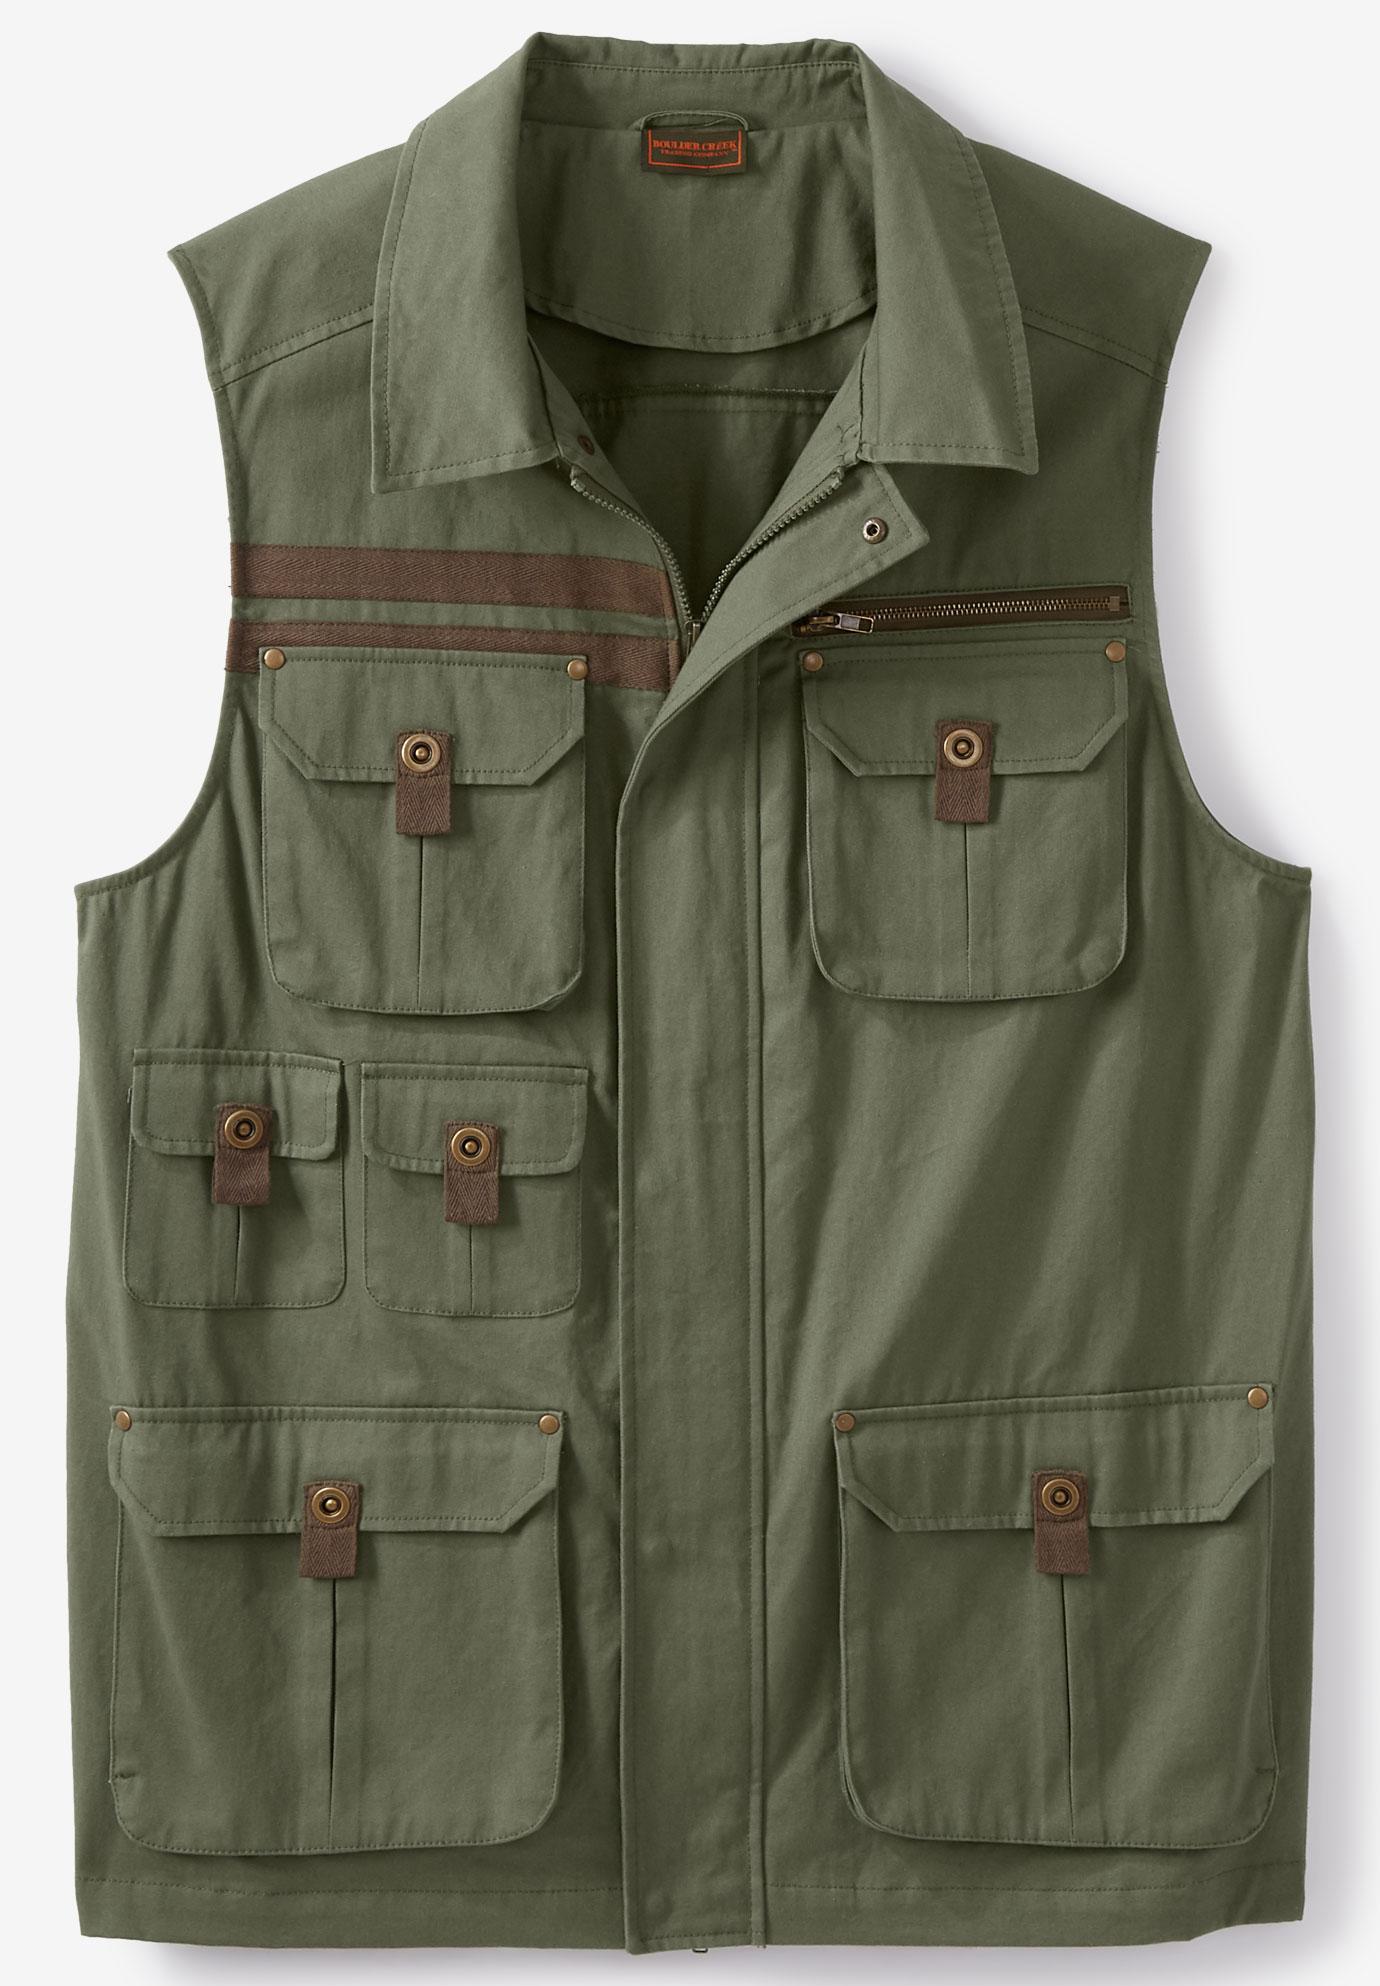 Western Leather Cowboy Vest